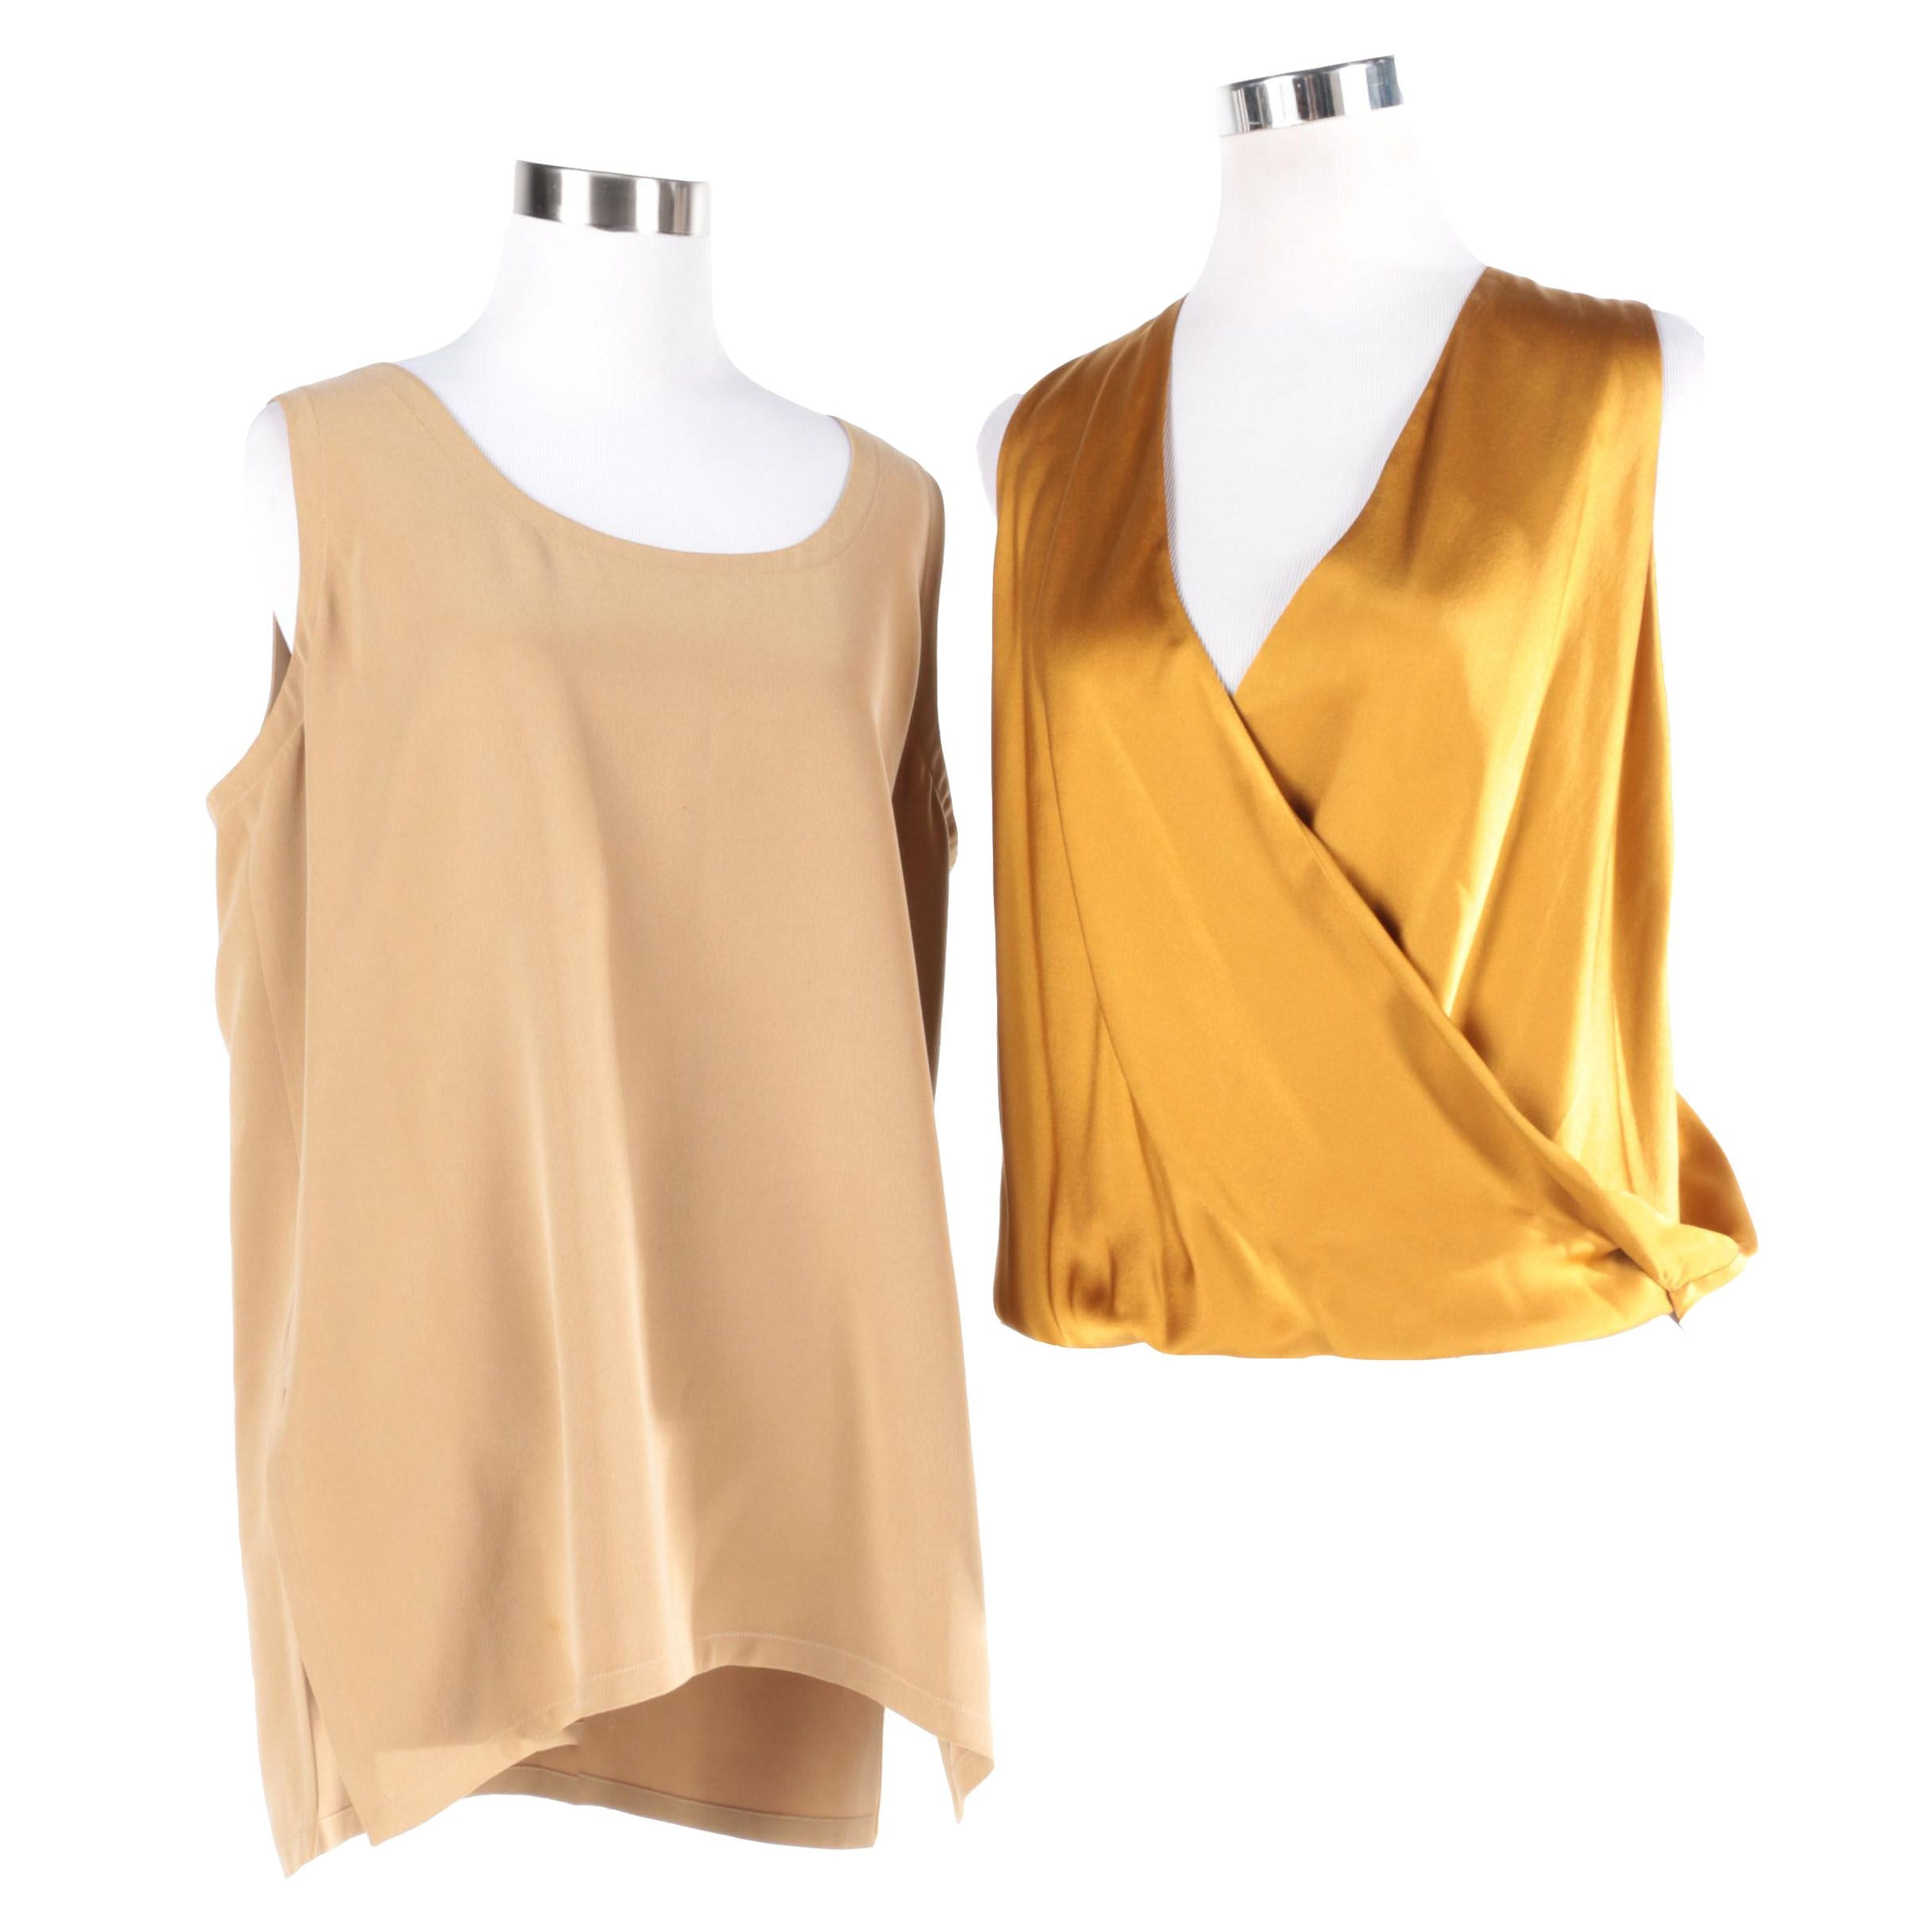 Women's Blouses Featuring Calvin Klein